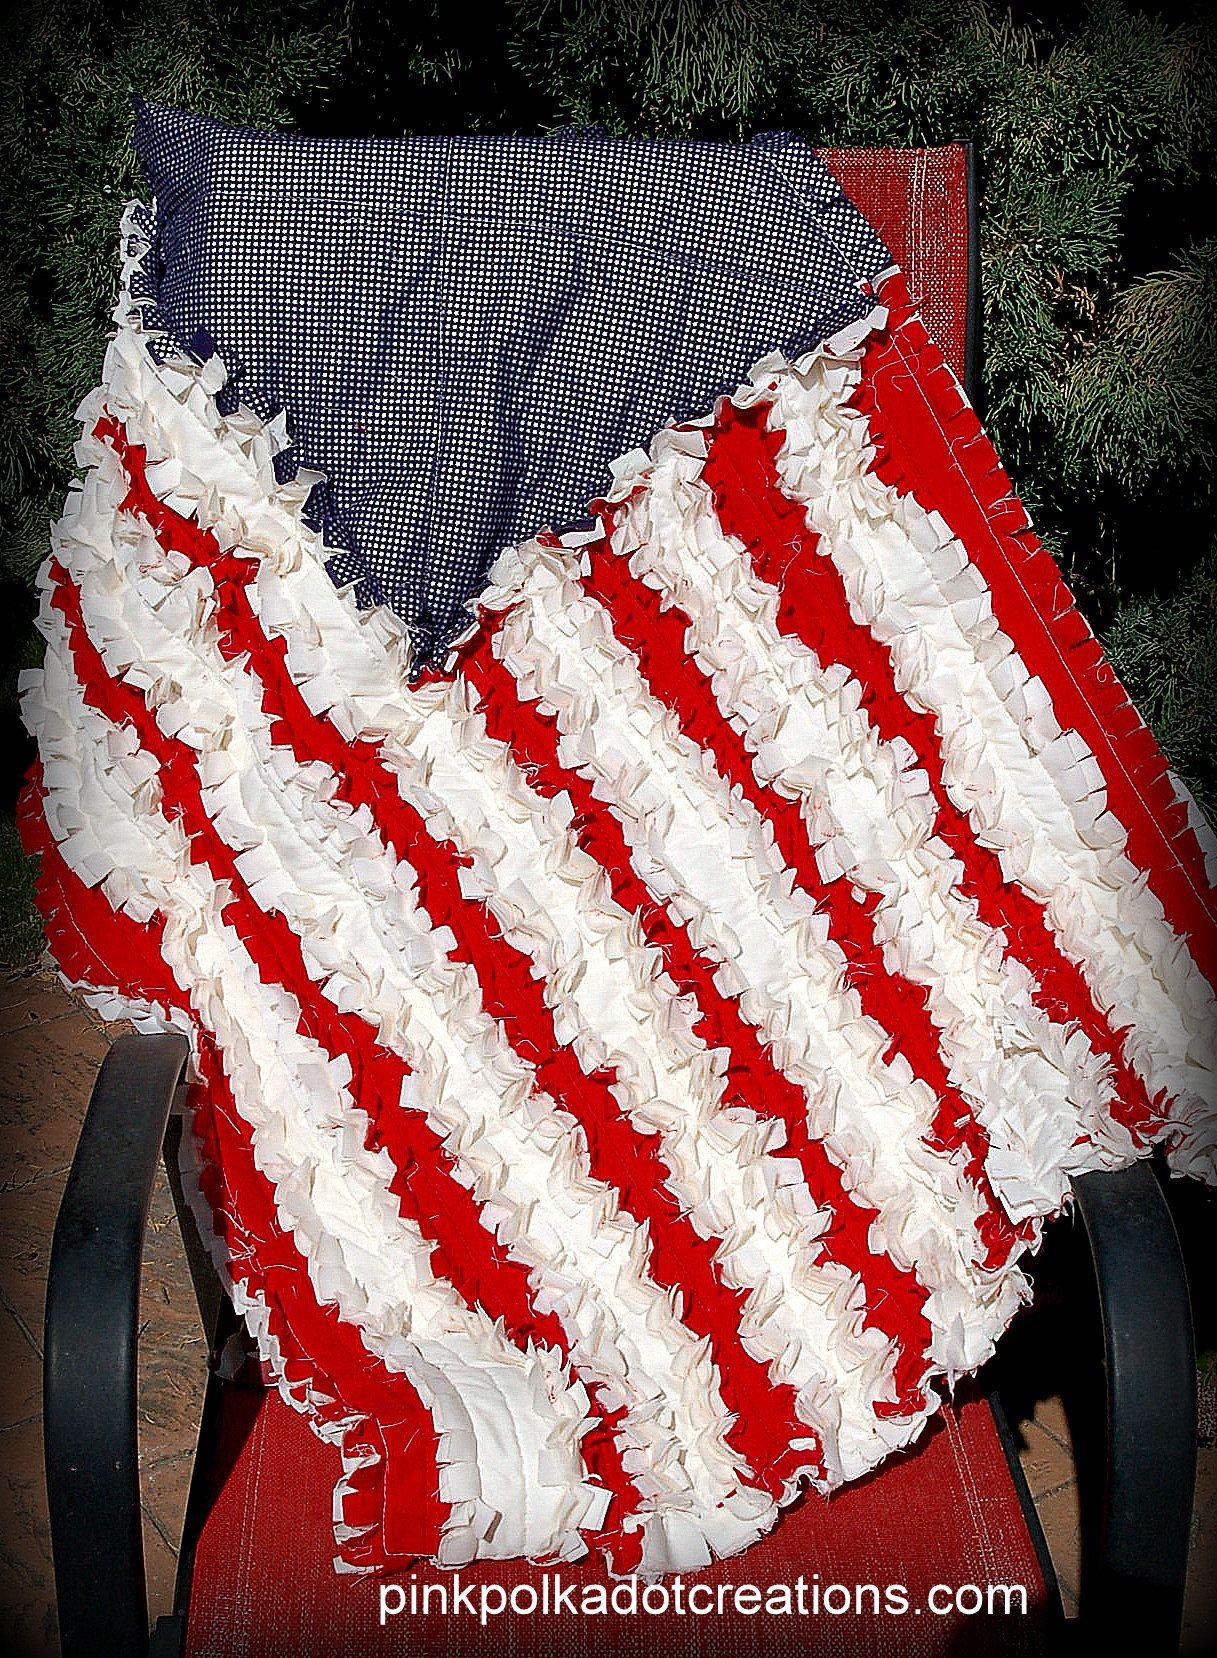 PINTEREST EASY QUILTS | Flag Rag Quilt | Pink Polka Dot Creations ... : rag quilts pinterest - Adamdwight.com